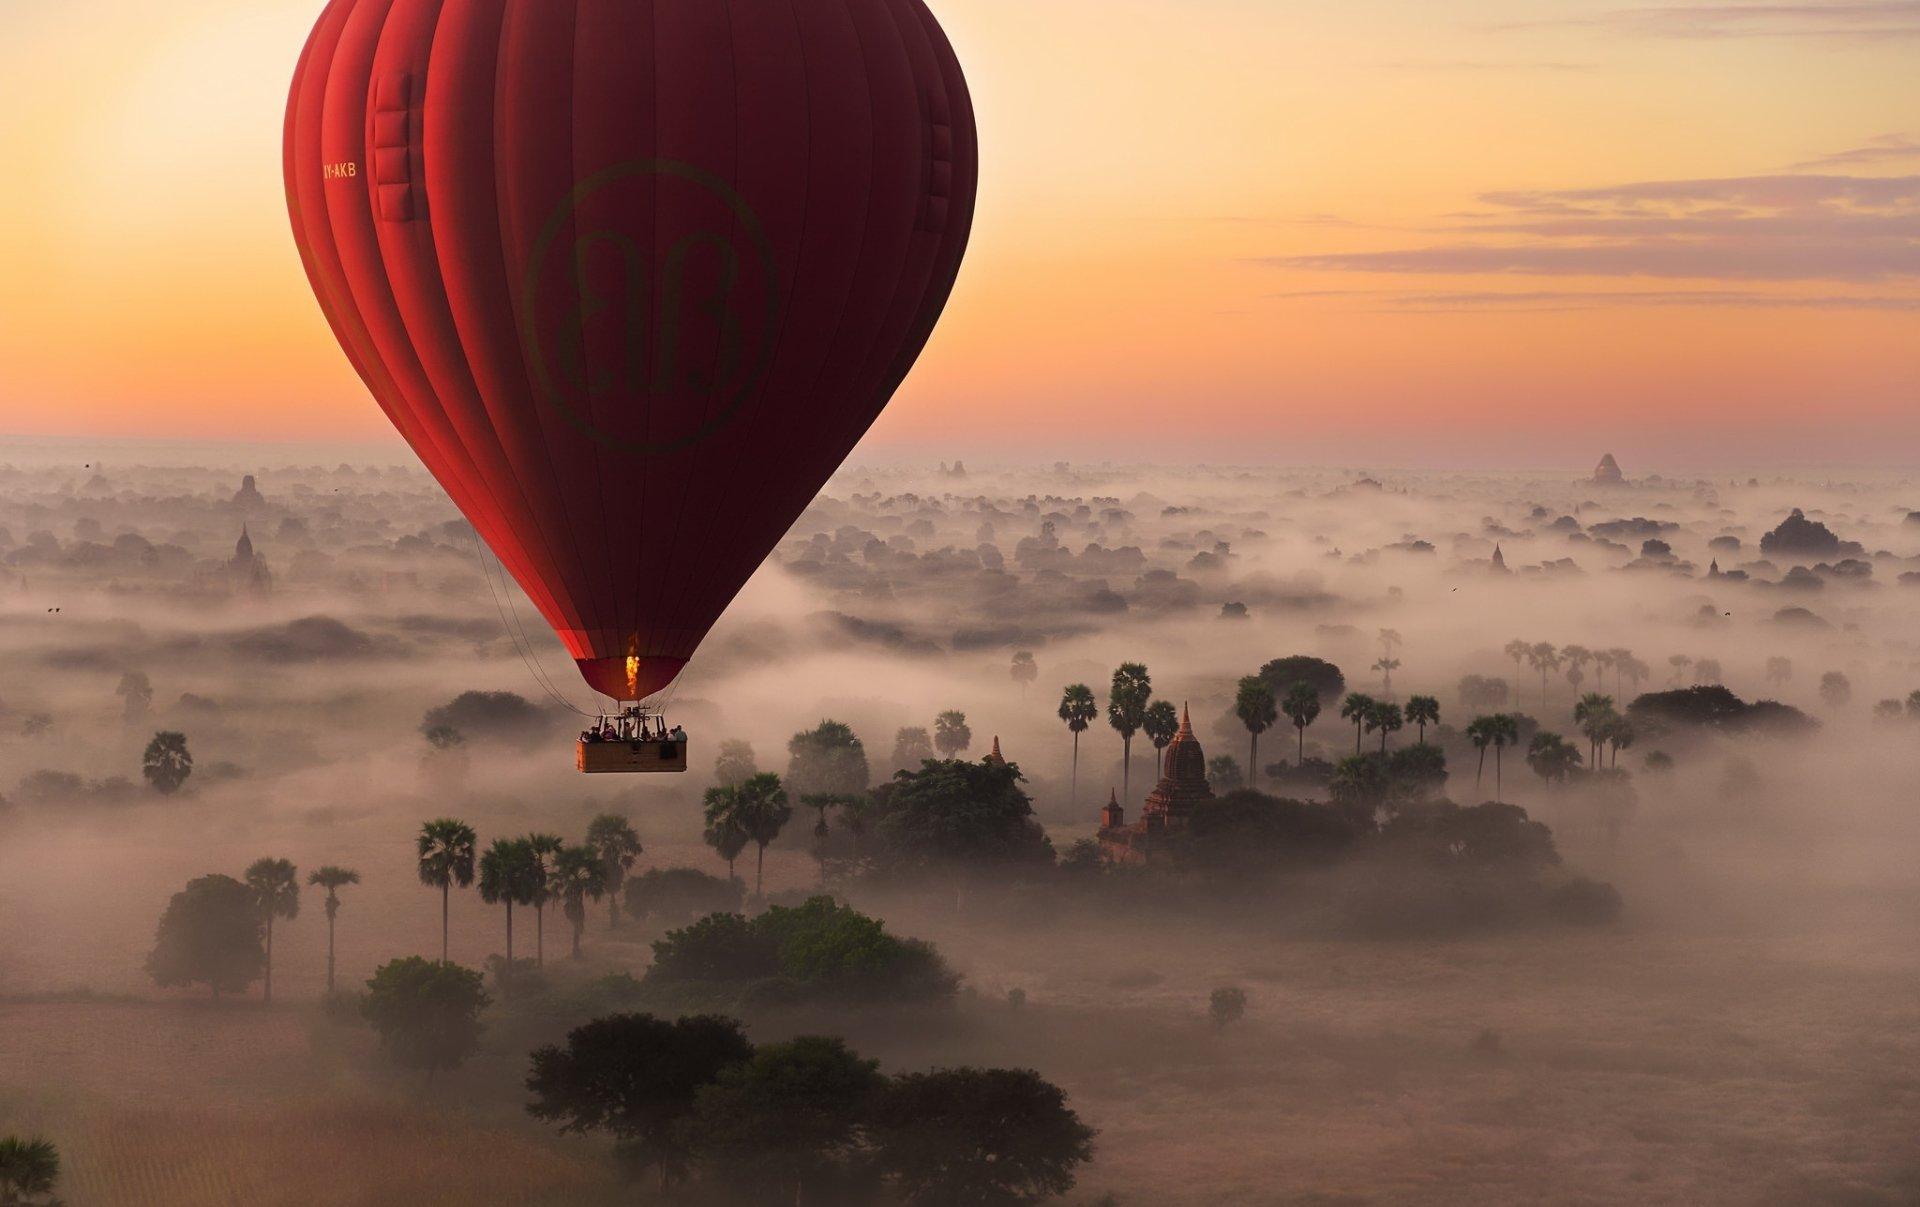 Vehicles - Hot Air Balloon  Landscape Fog Sunrise Sky Horizon Wallpaper